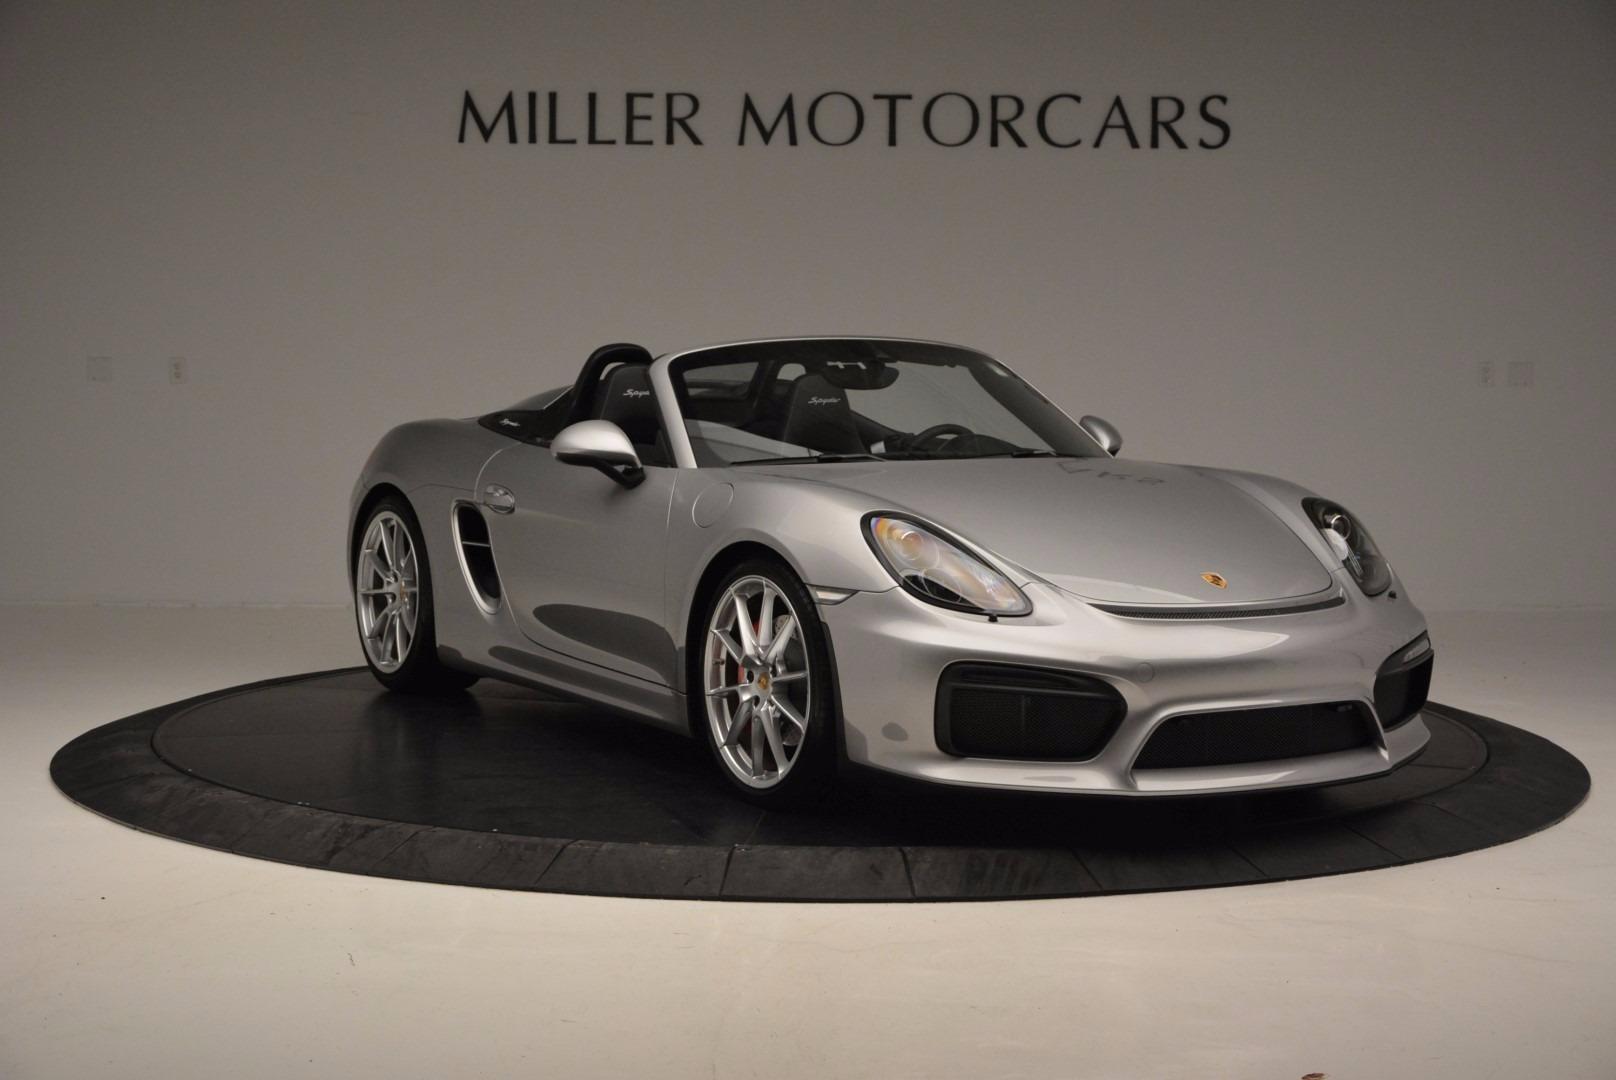 Used 2016 Porsche Boxster Spyder For Sale In Greenwich, CT. Alfa Romeo of Greenwich, 4307A 718_p11